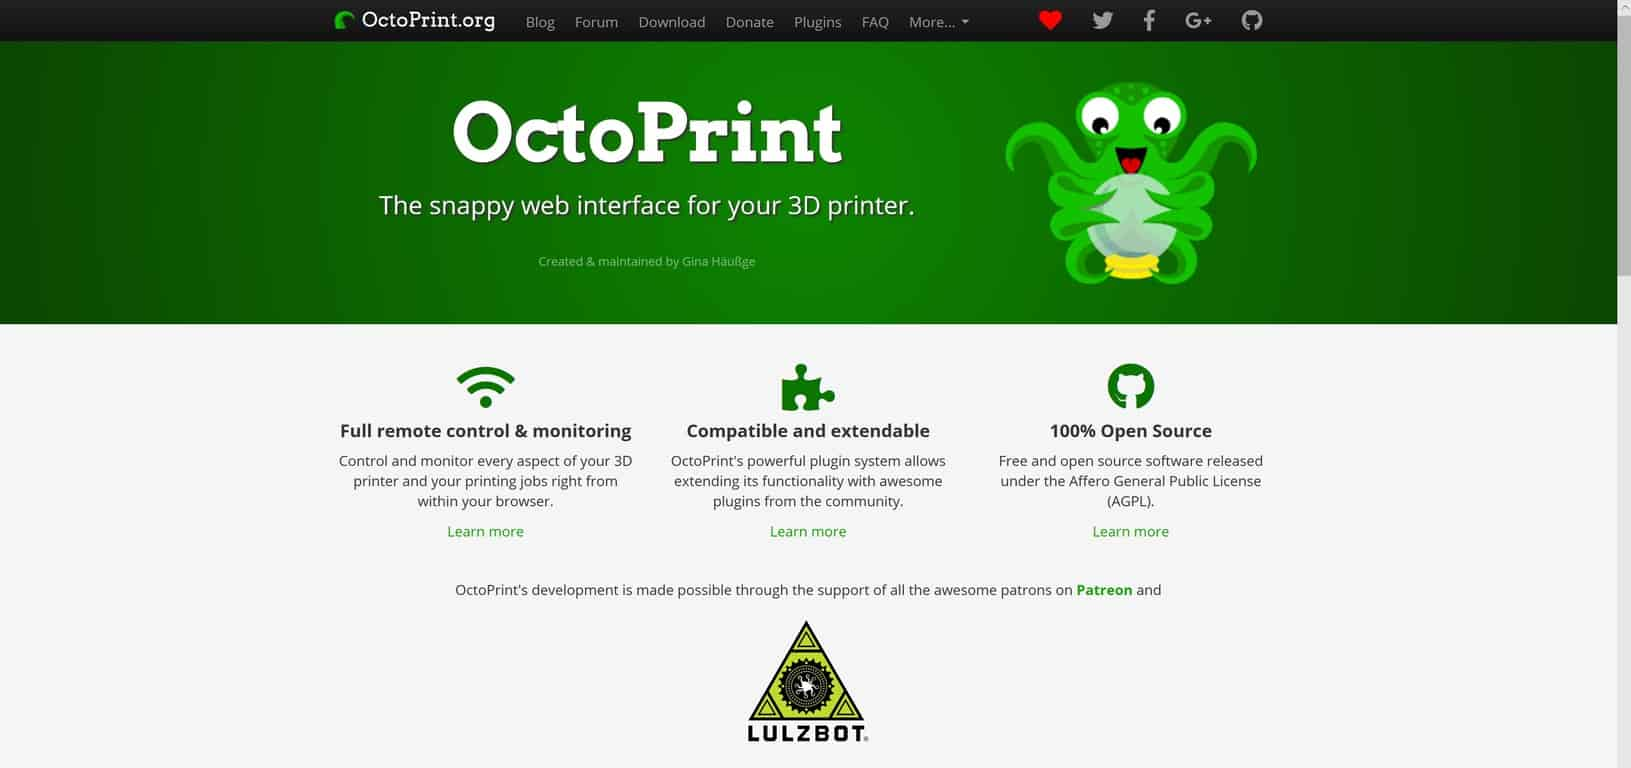 How to Control a 3D Printer with a Raspberry Pi OnMSFT com